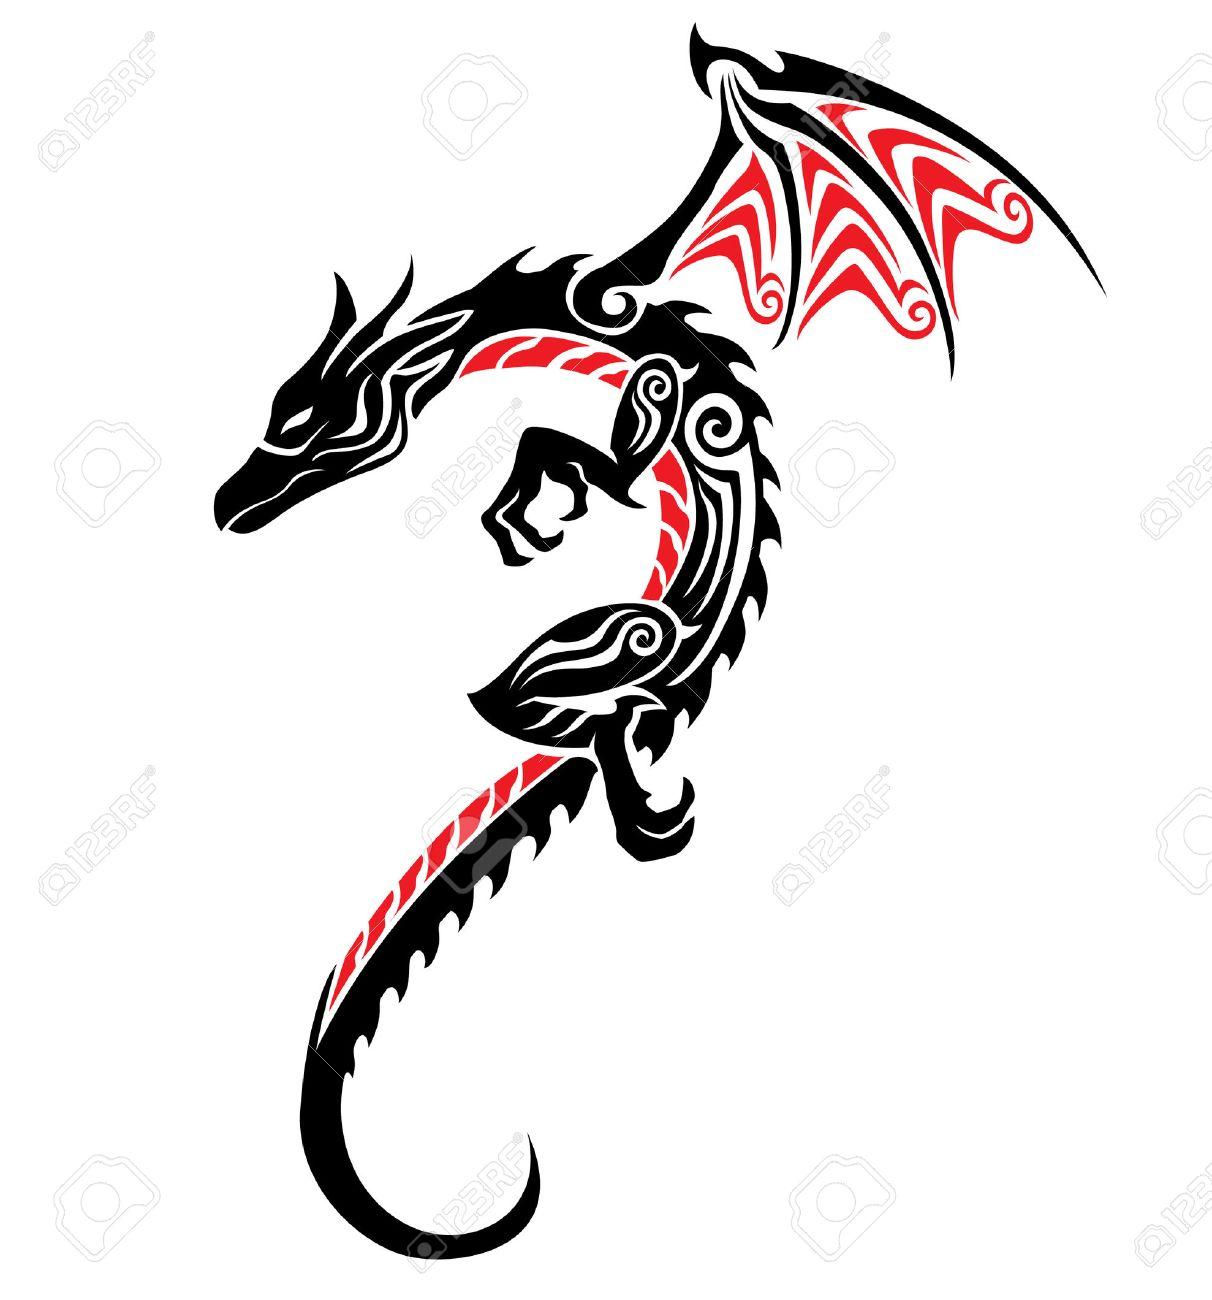 8e3facdf4b8ef Dragon Tribal Tattoo Royalty Free Cliparts, Vectors, And Stock ...